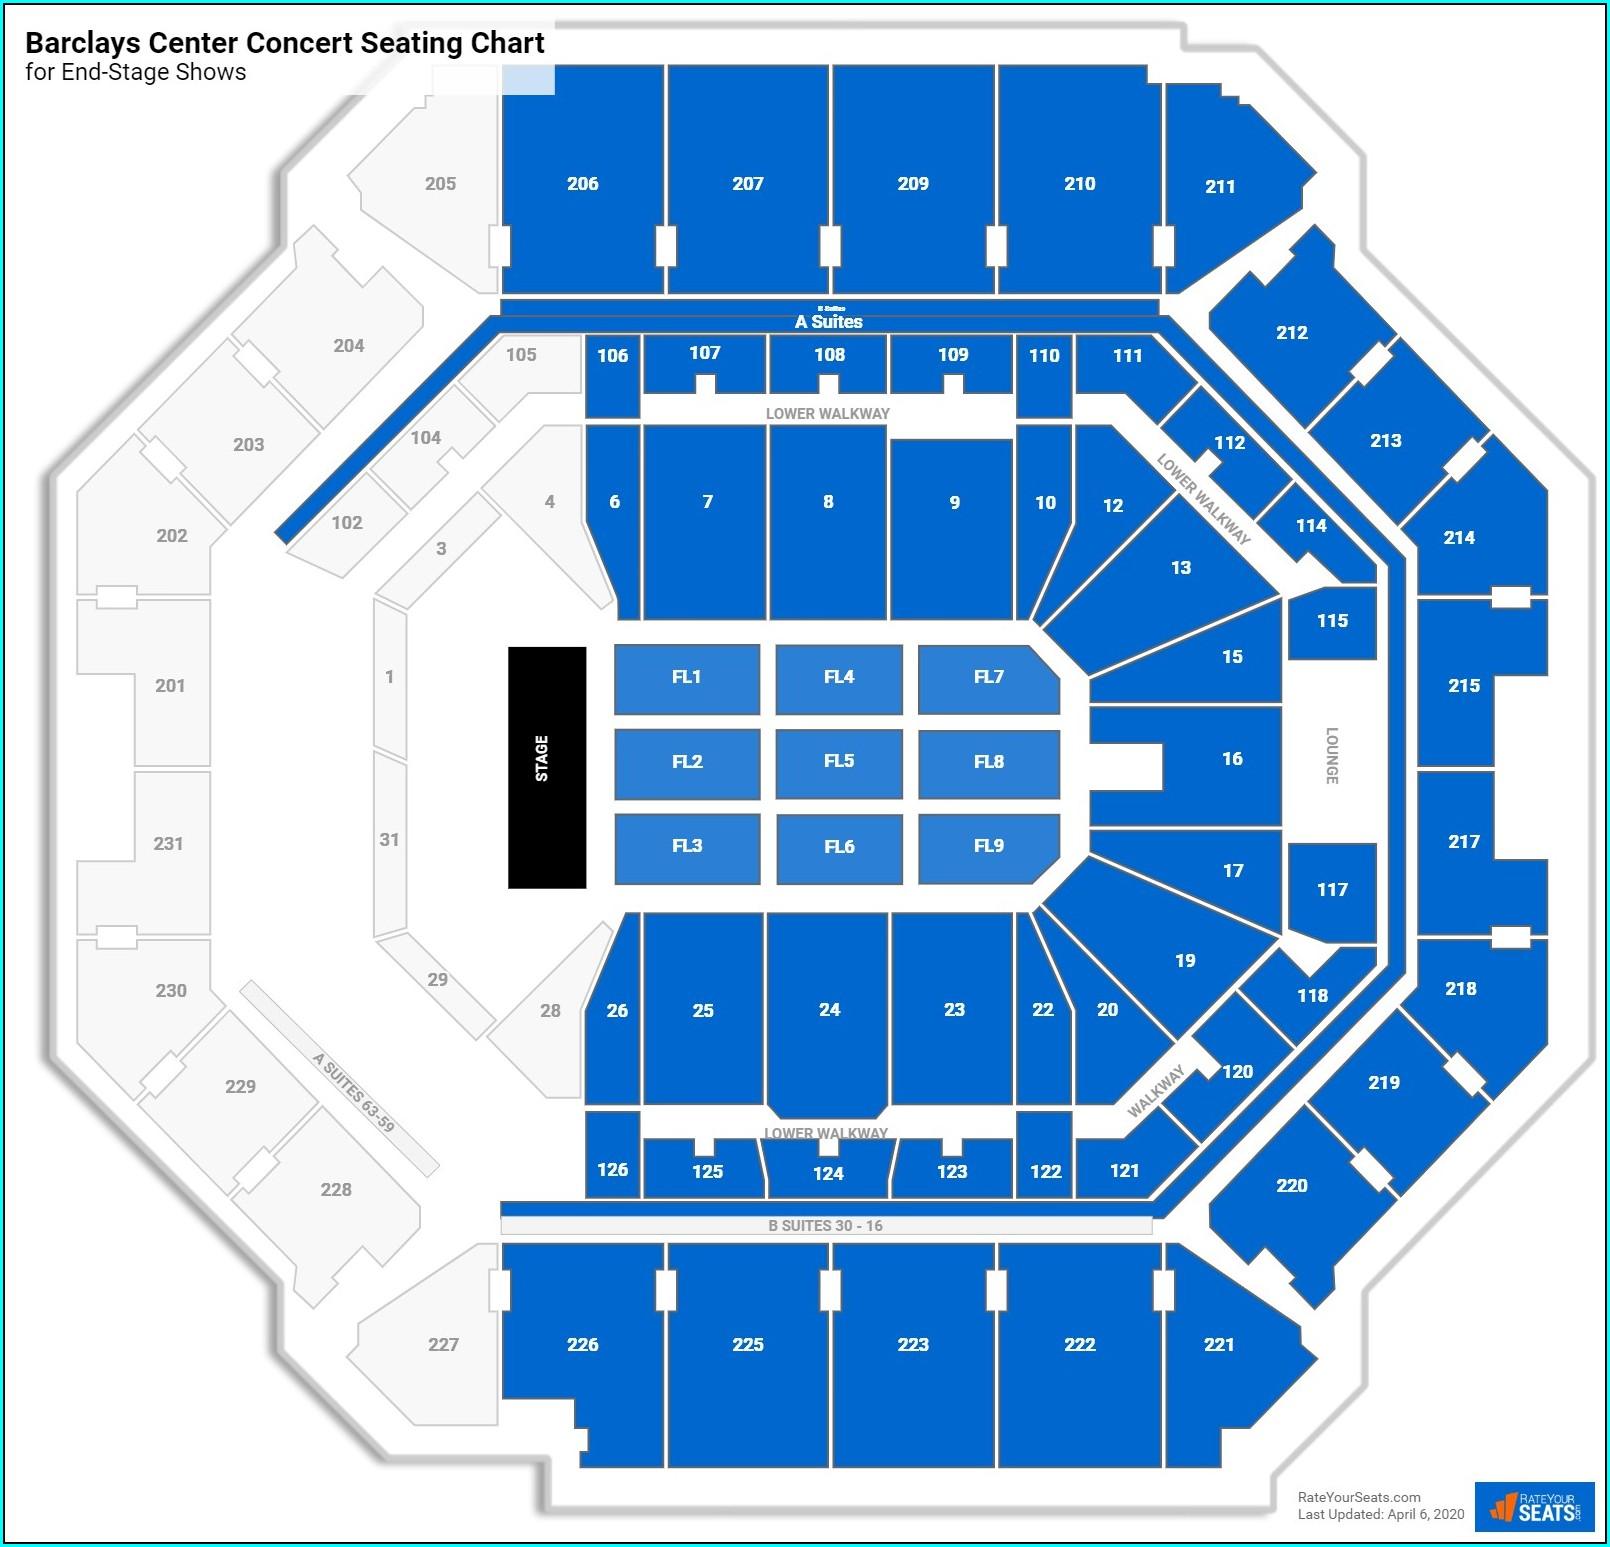 Barclays Center Suite Map